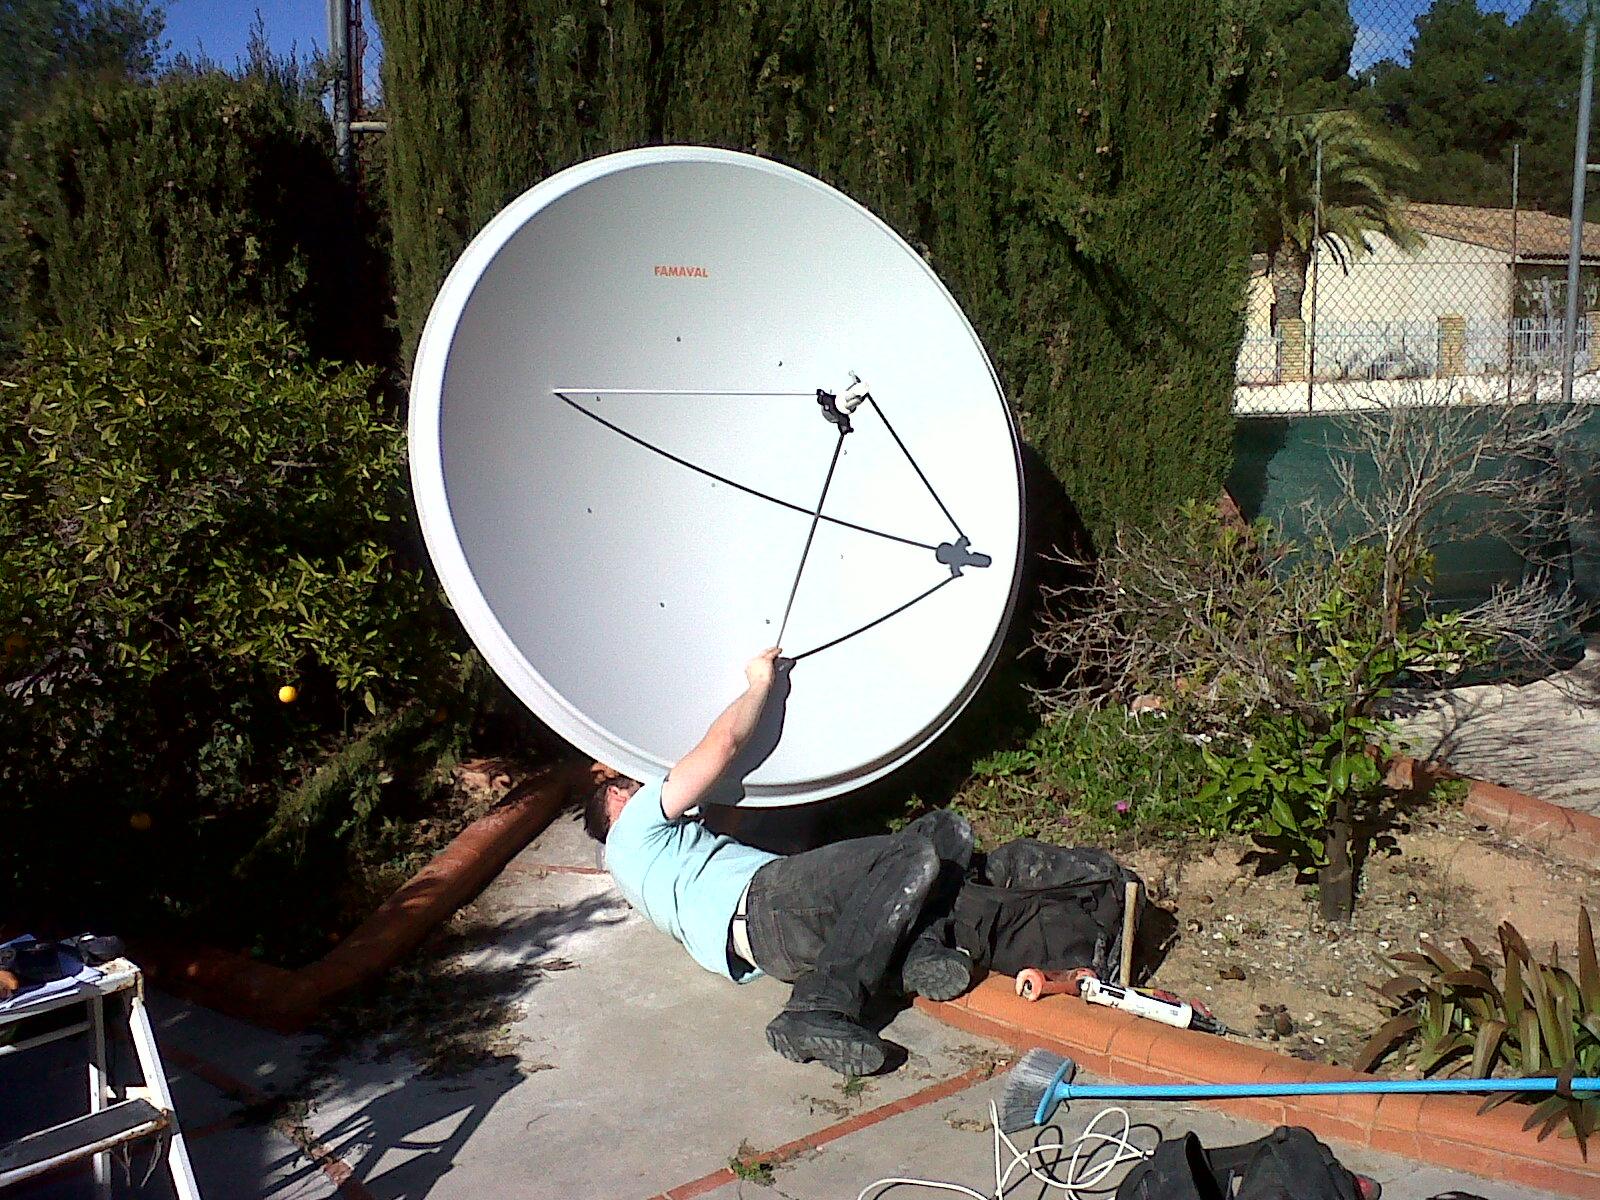 Big Satellite Dish Famaval 1 9 Sky Tv Freesat Uk